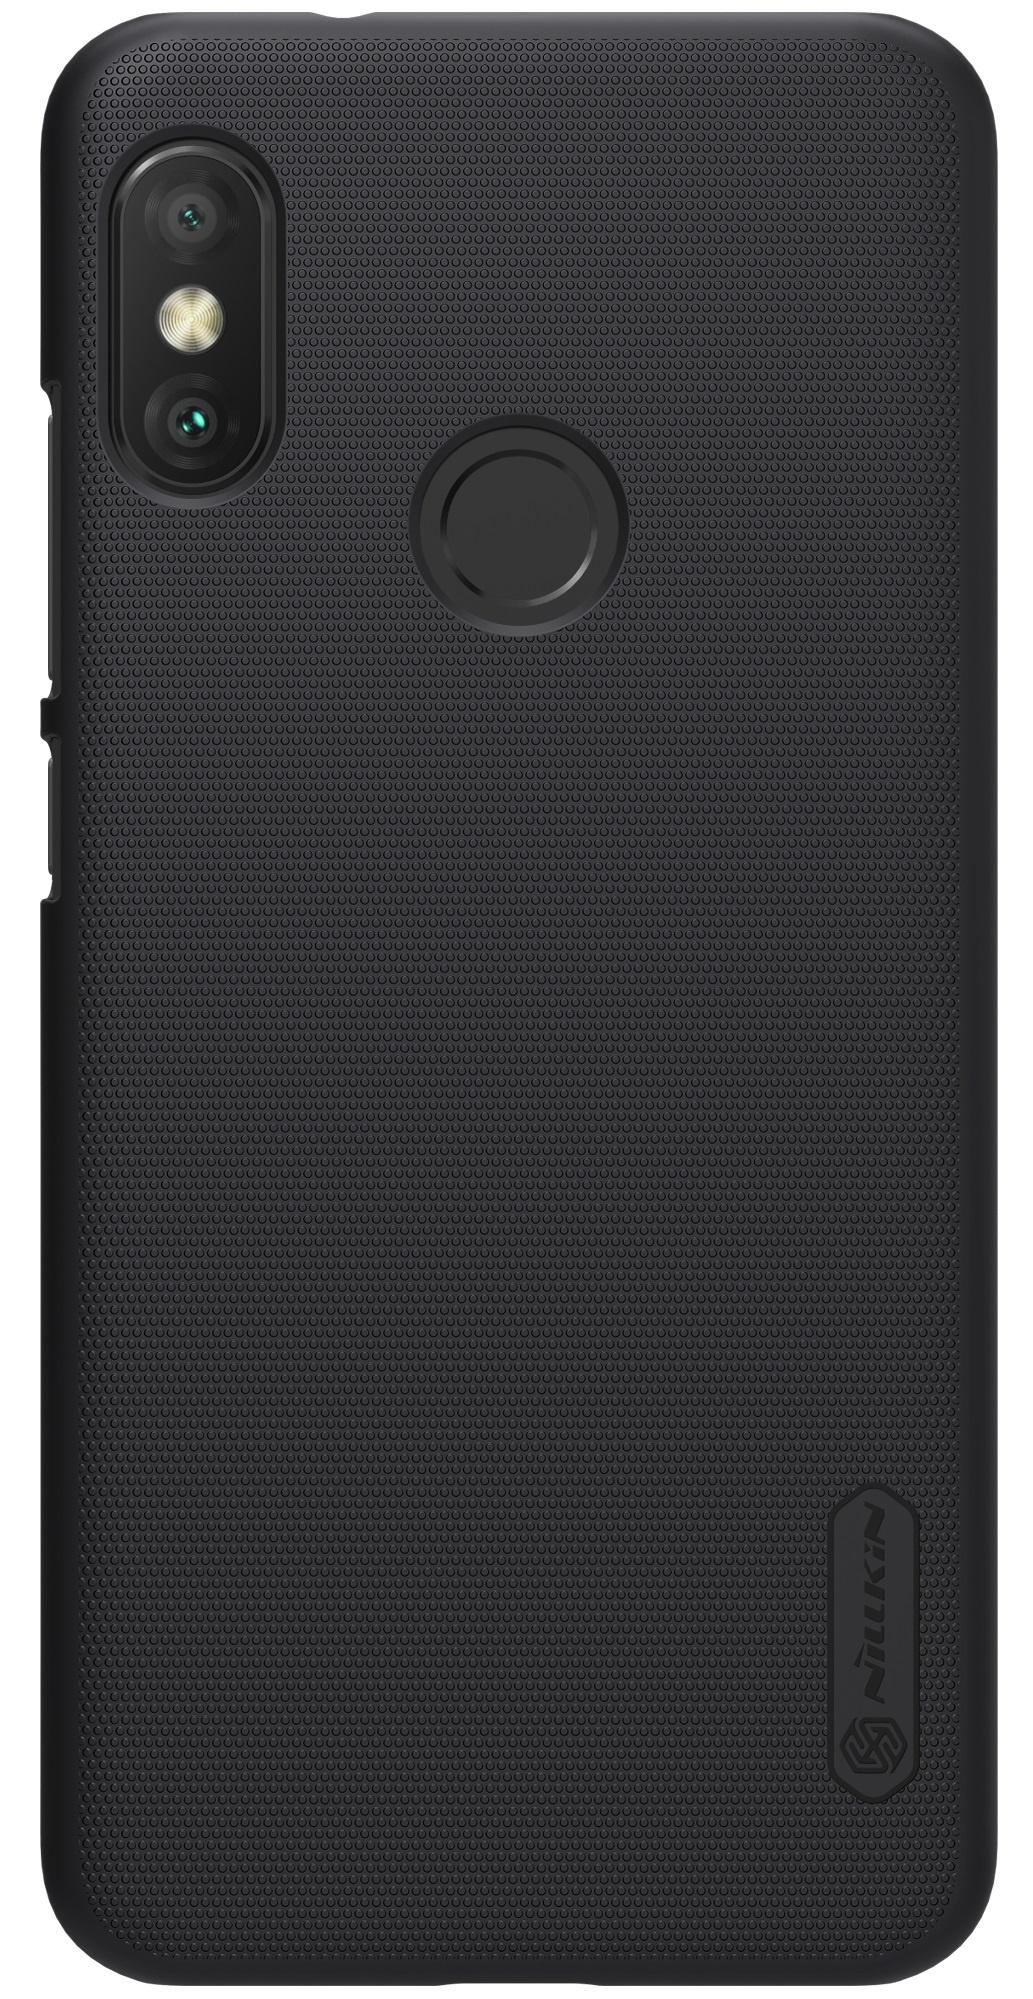 Накладка Nillkin Super Frosted для Xiaomi A2 Lite/6 PRO, 6902048161054, черный силиконовая накладка nillkin для xiaomi mi a2 white